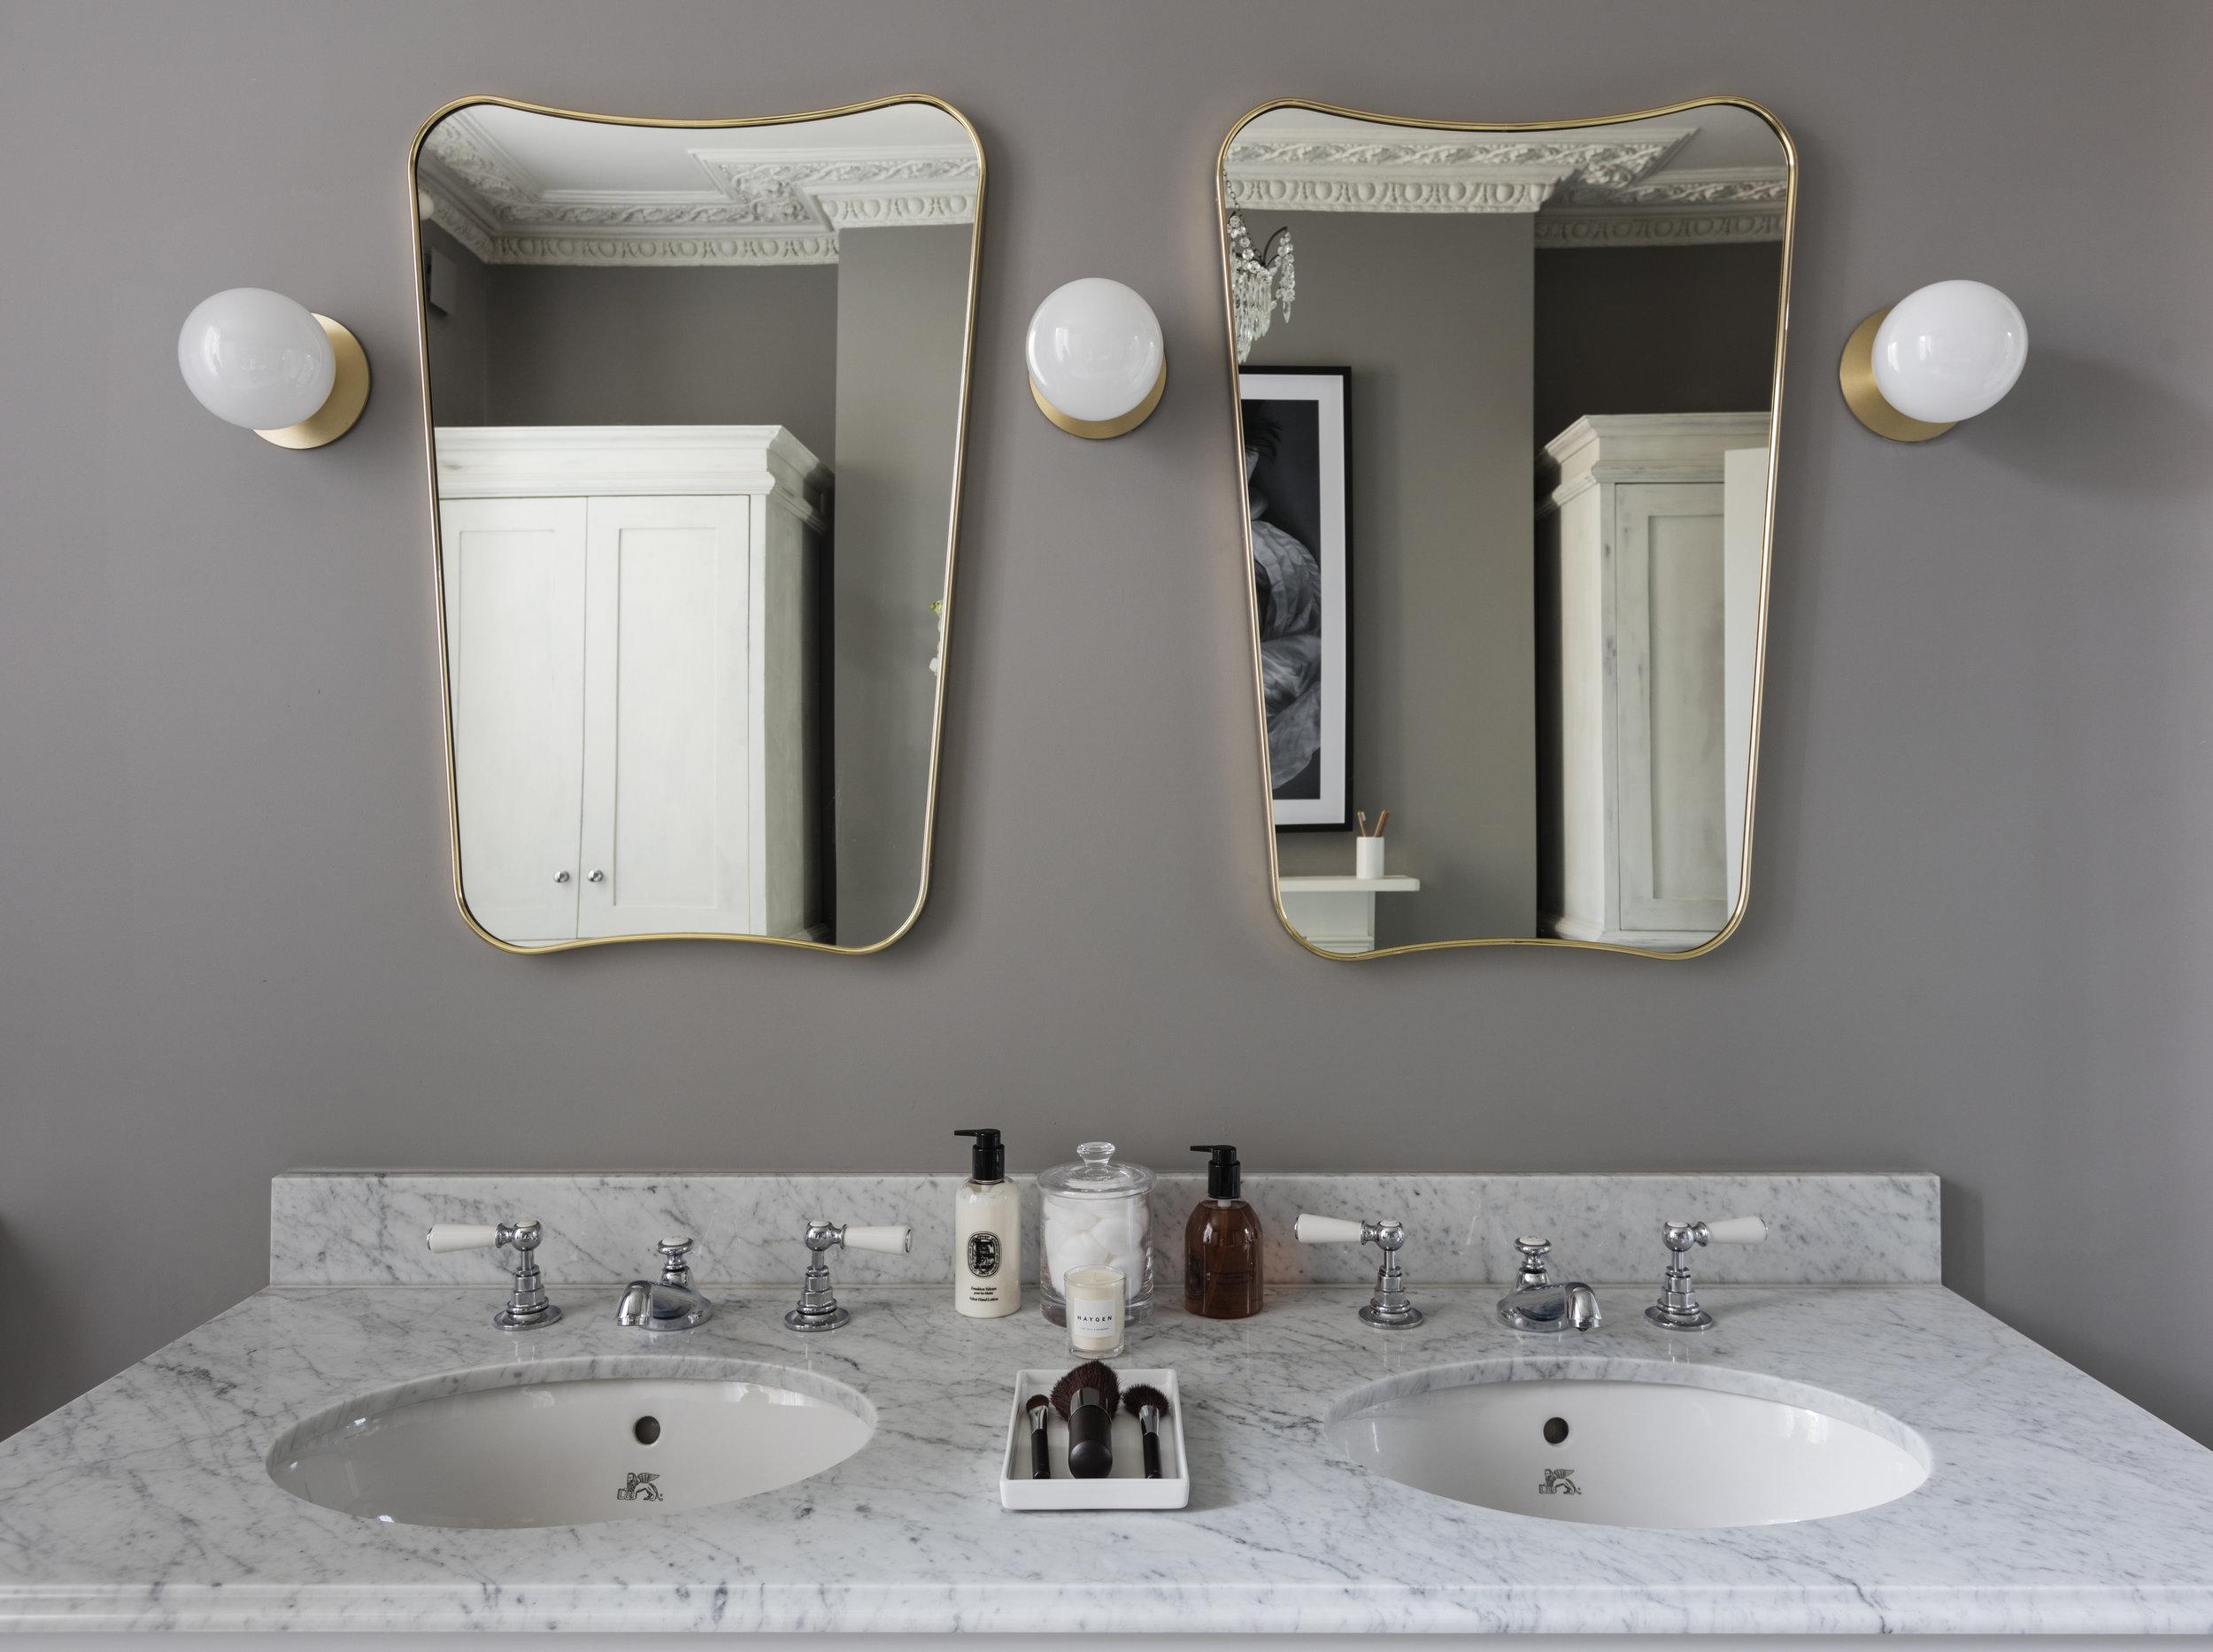 Double wash basin in master en-suite